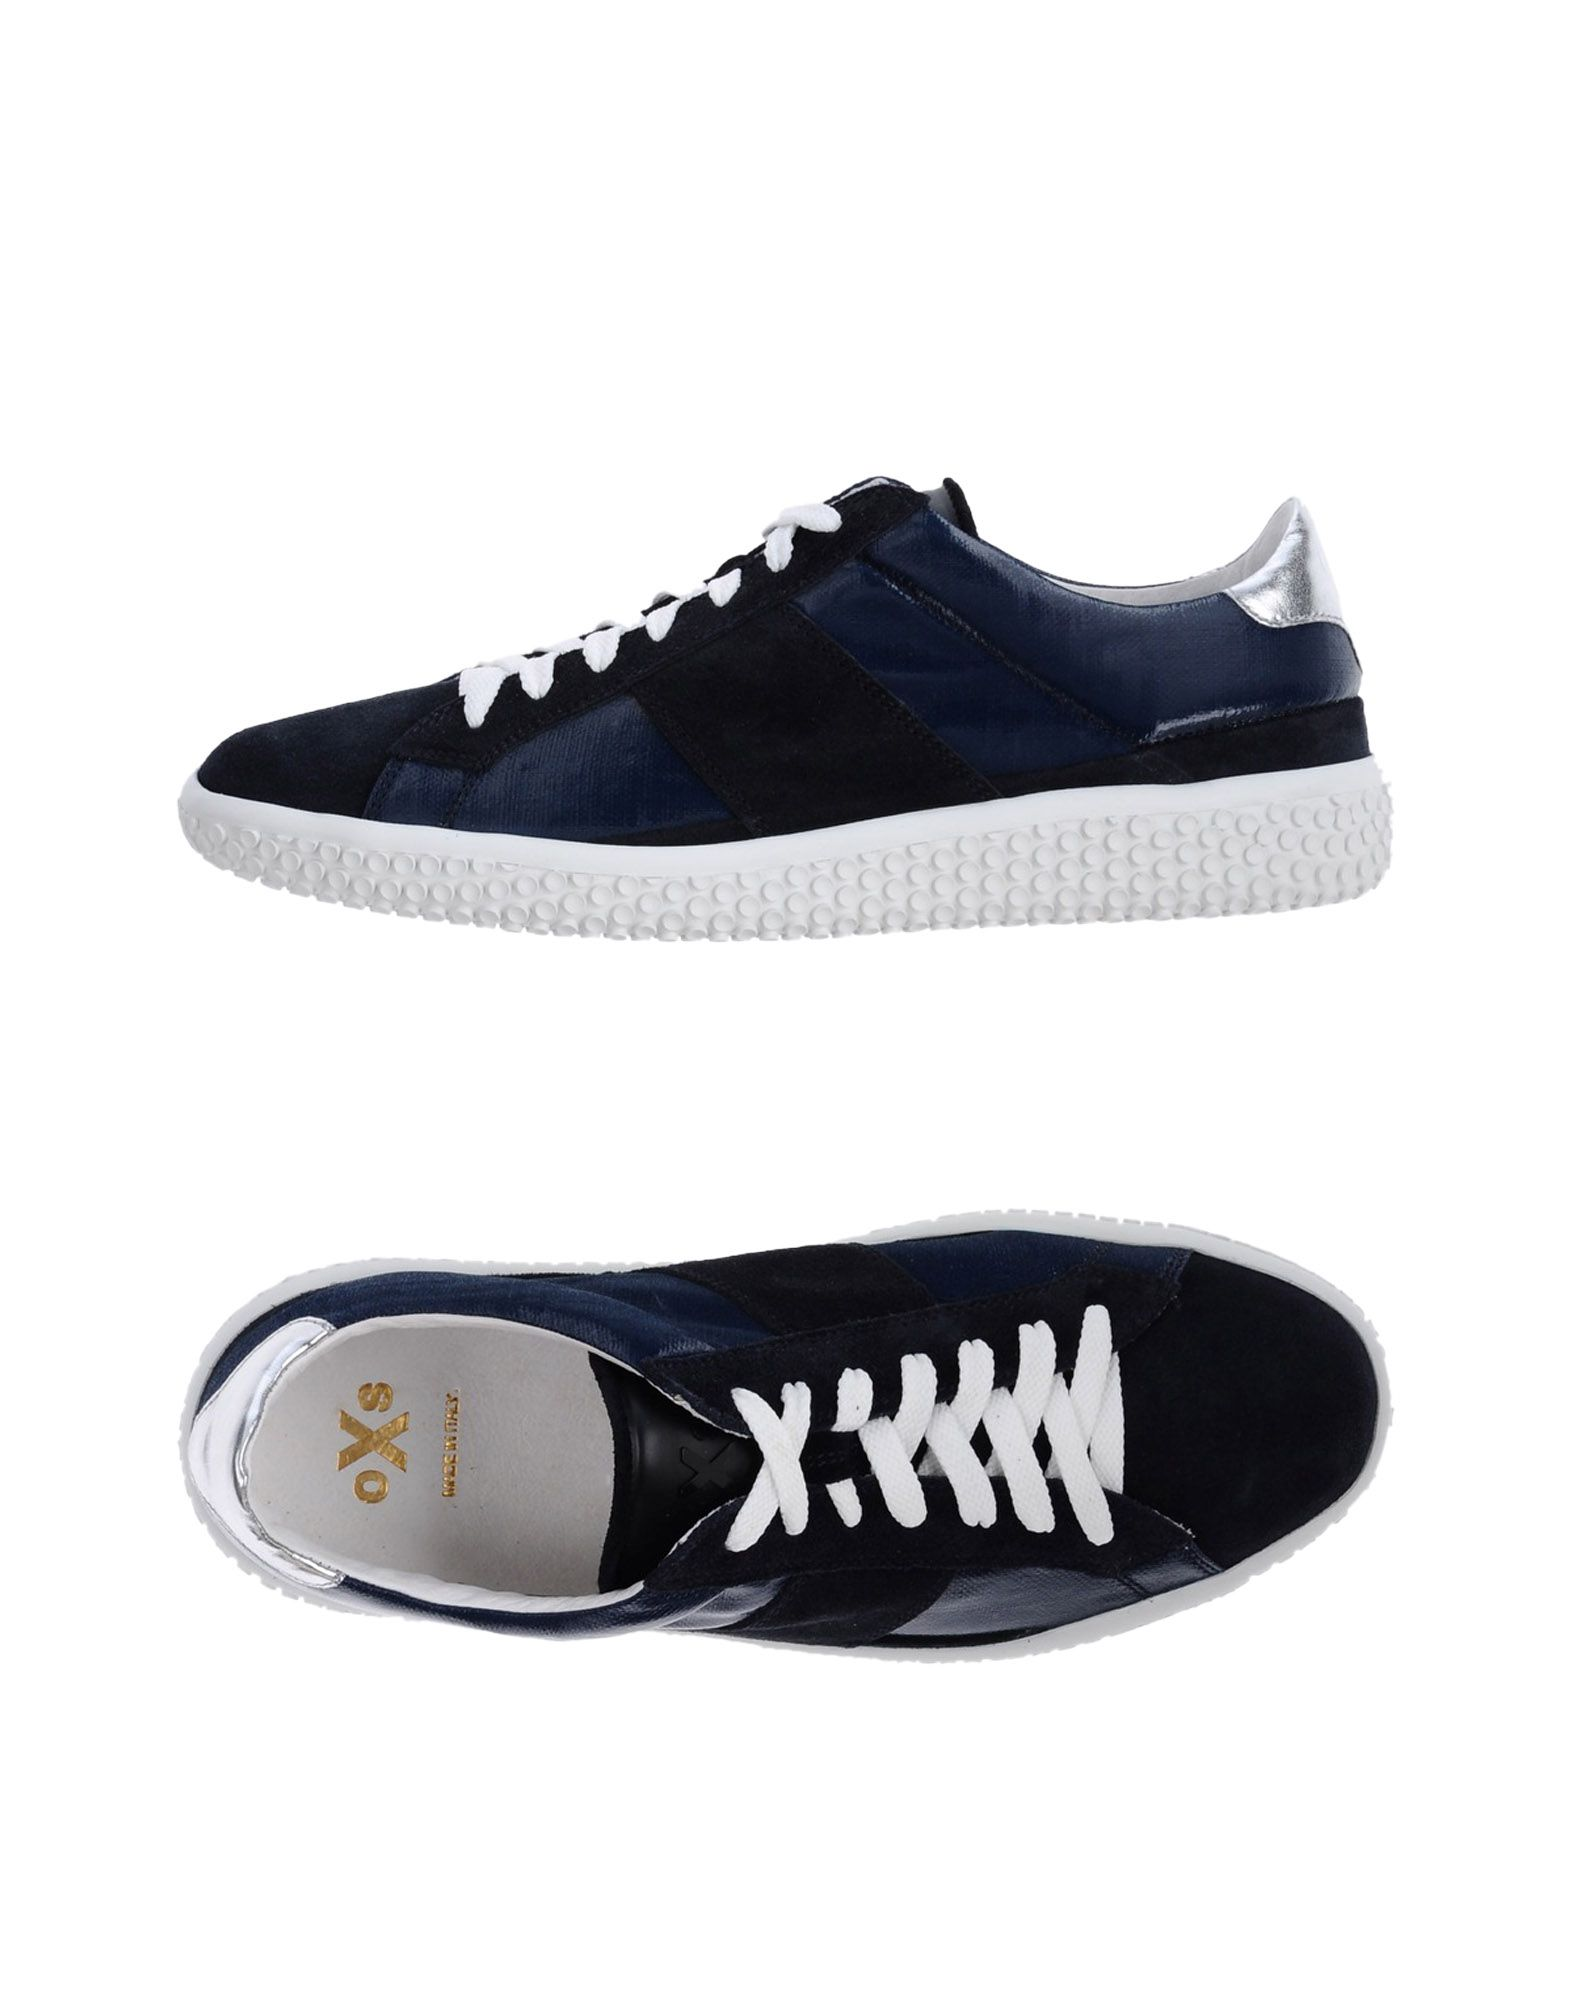 A buon mercato Sneakers O.X.S. Uomo - 11355177XP